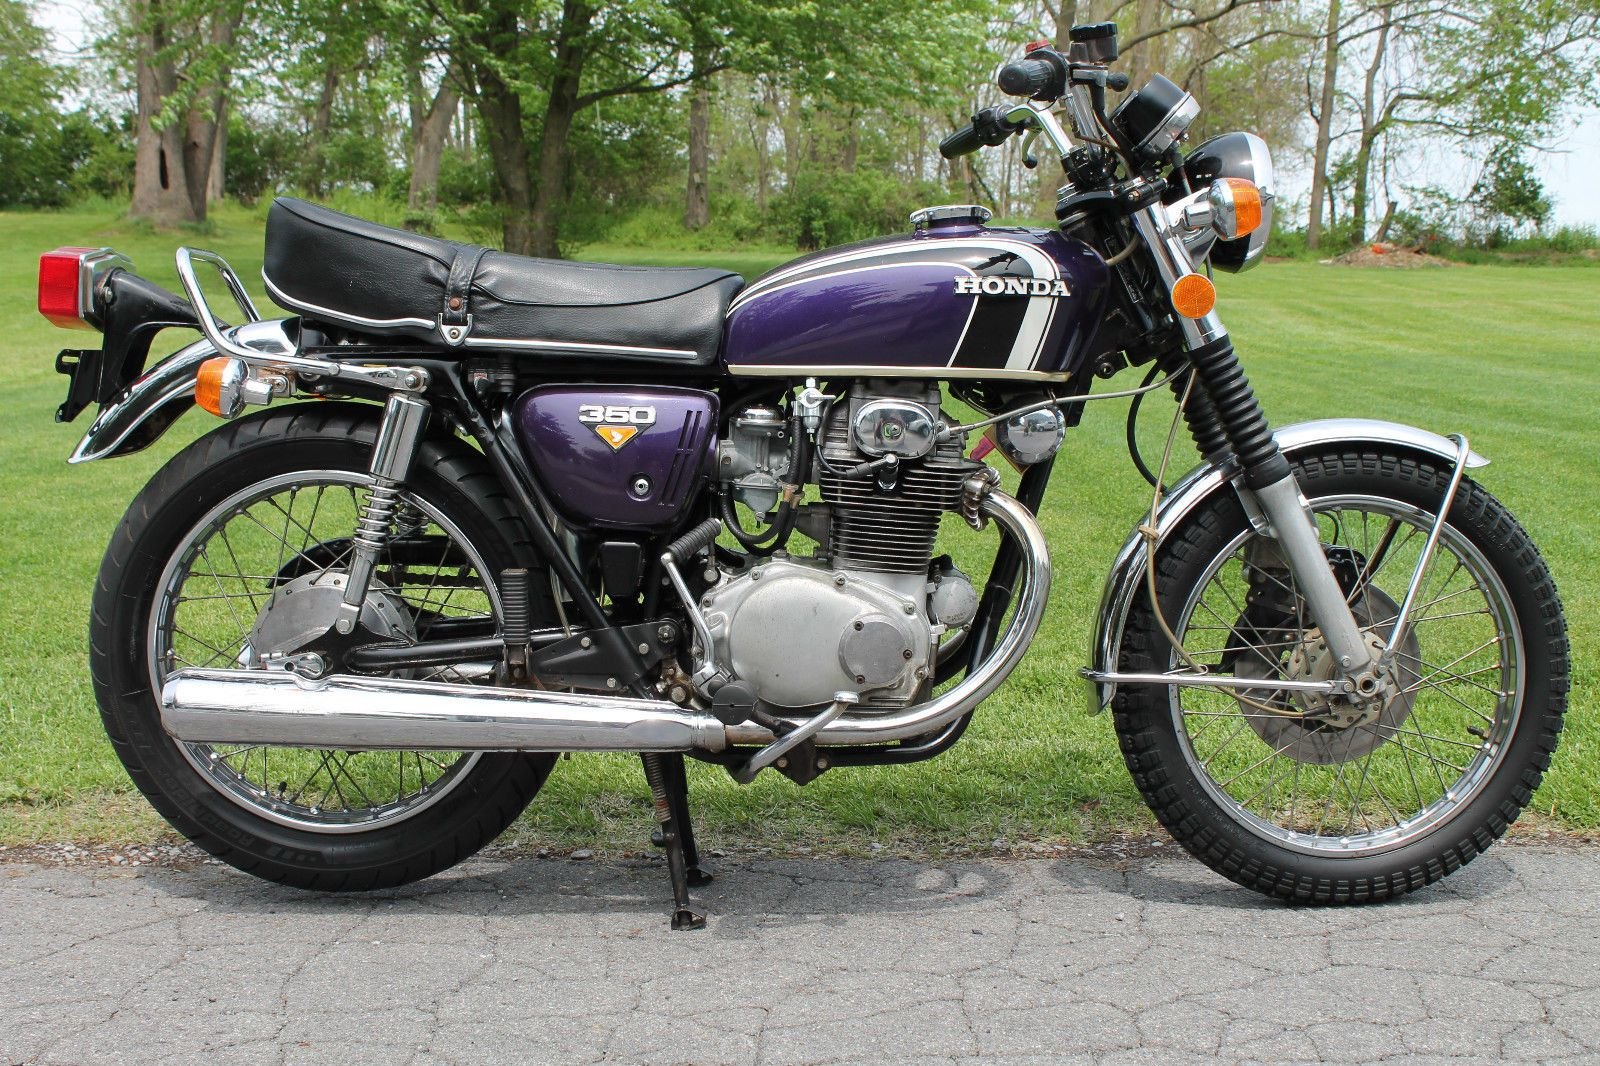 1973 Honda Cb Ebay Motors Motorcycles Honda Ebay Honda Cb Honda Japanese Motorcycle